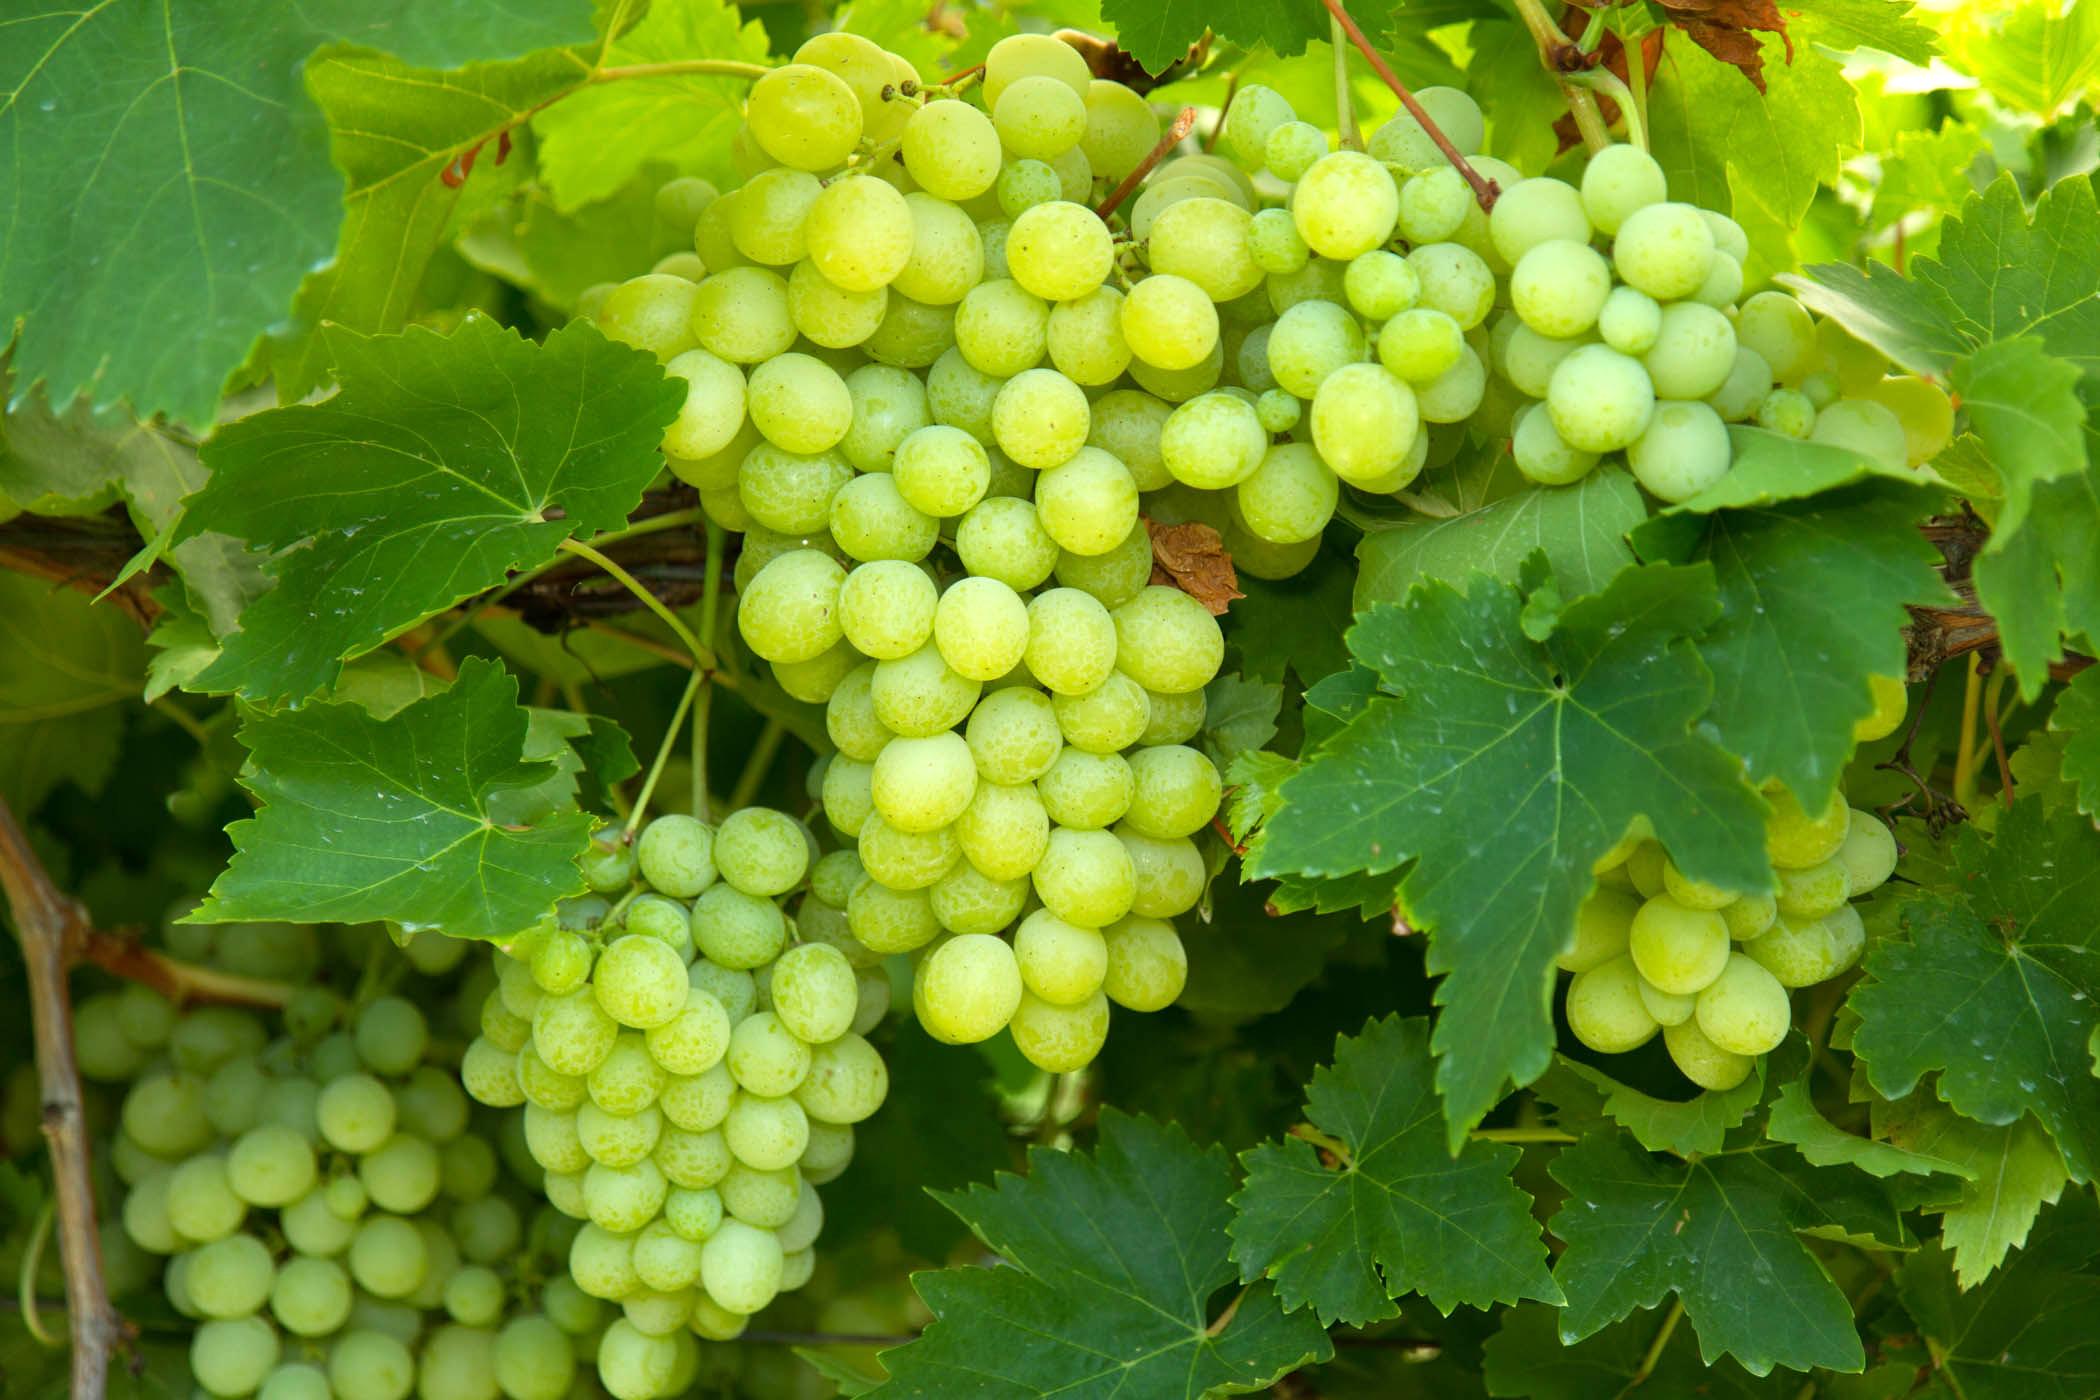 Grapes12.jpg